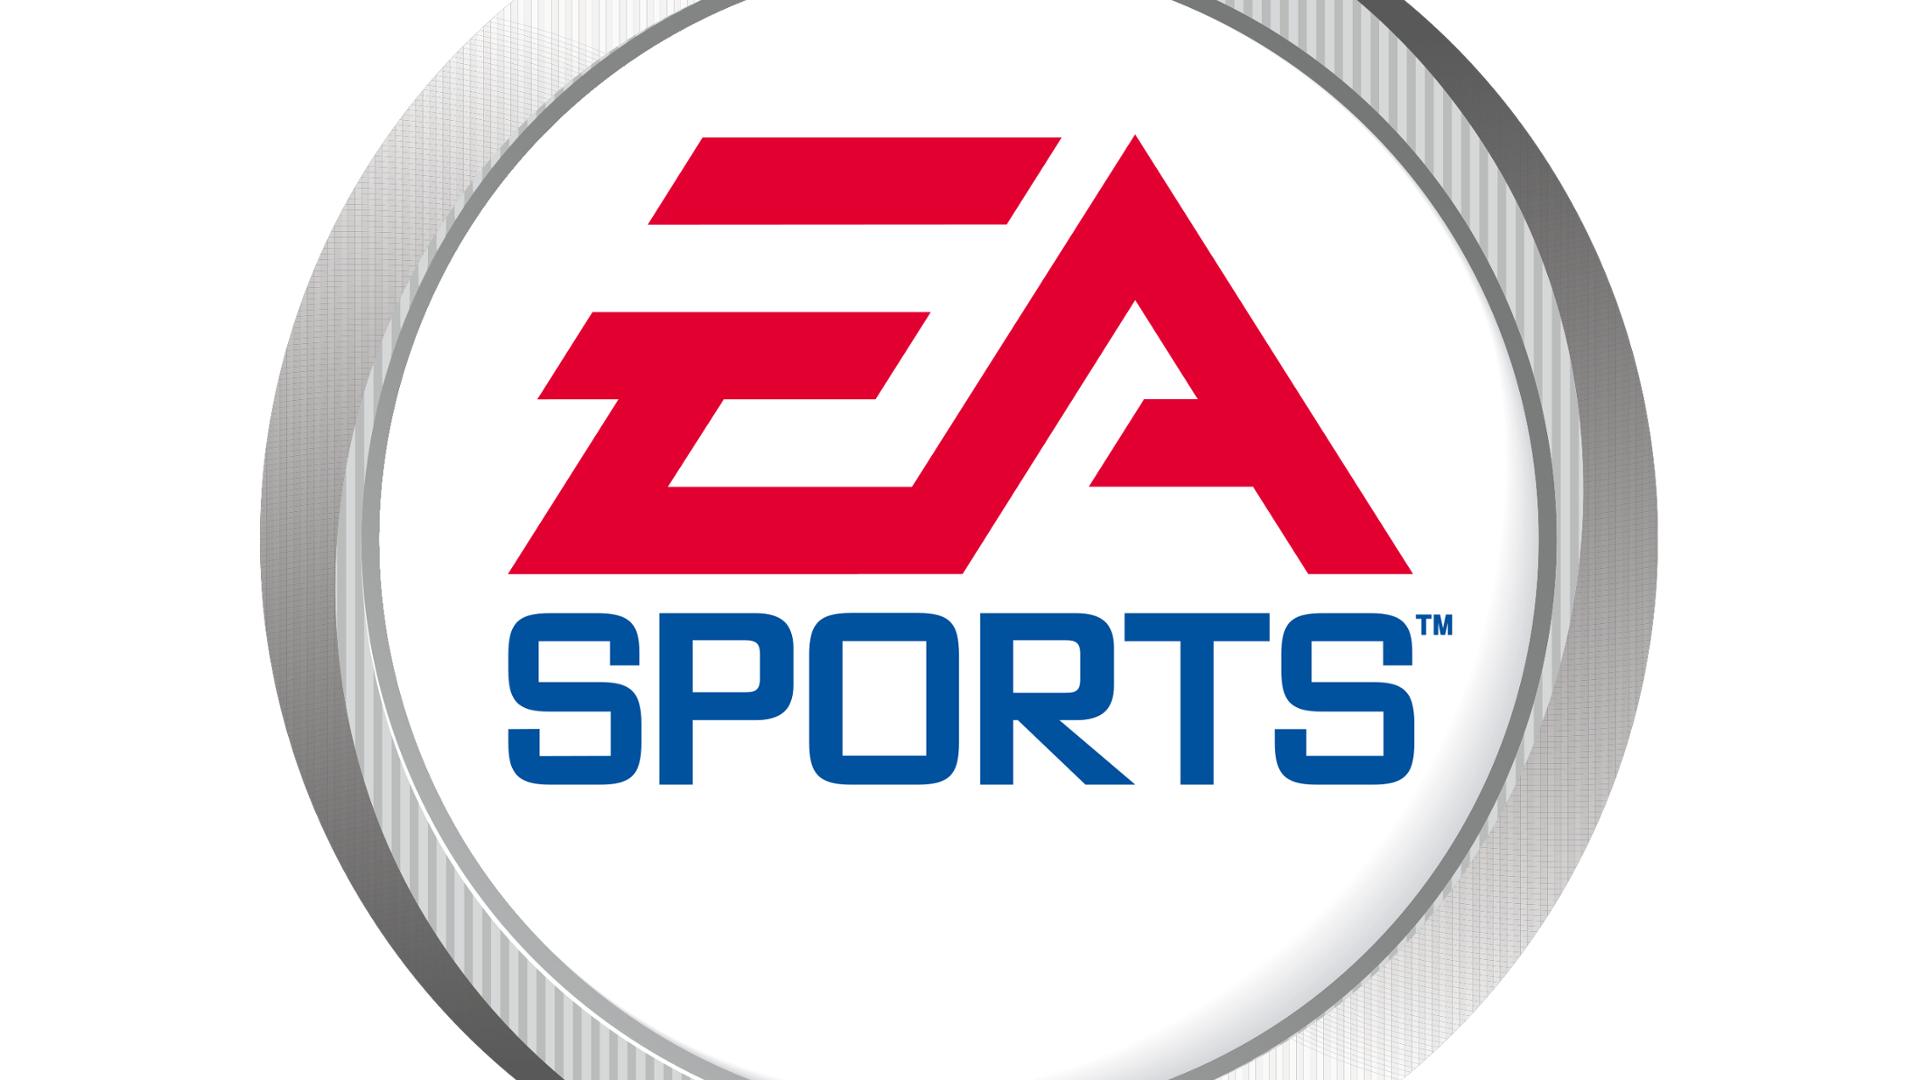 EA Sports still thriving in 2017, despite some high ...